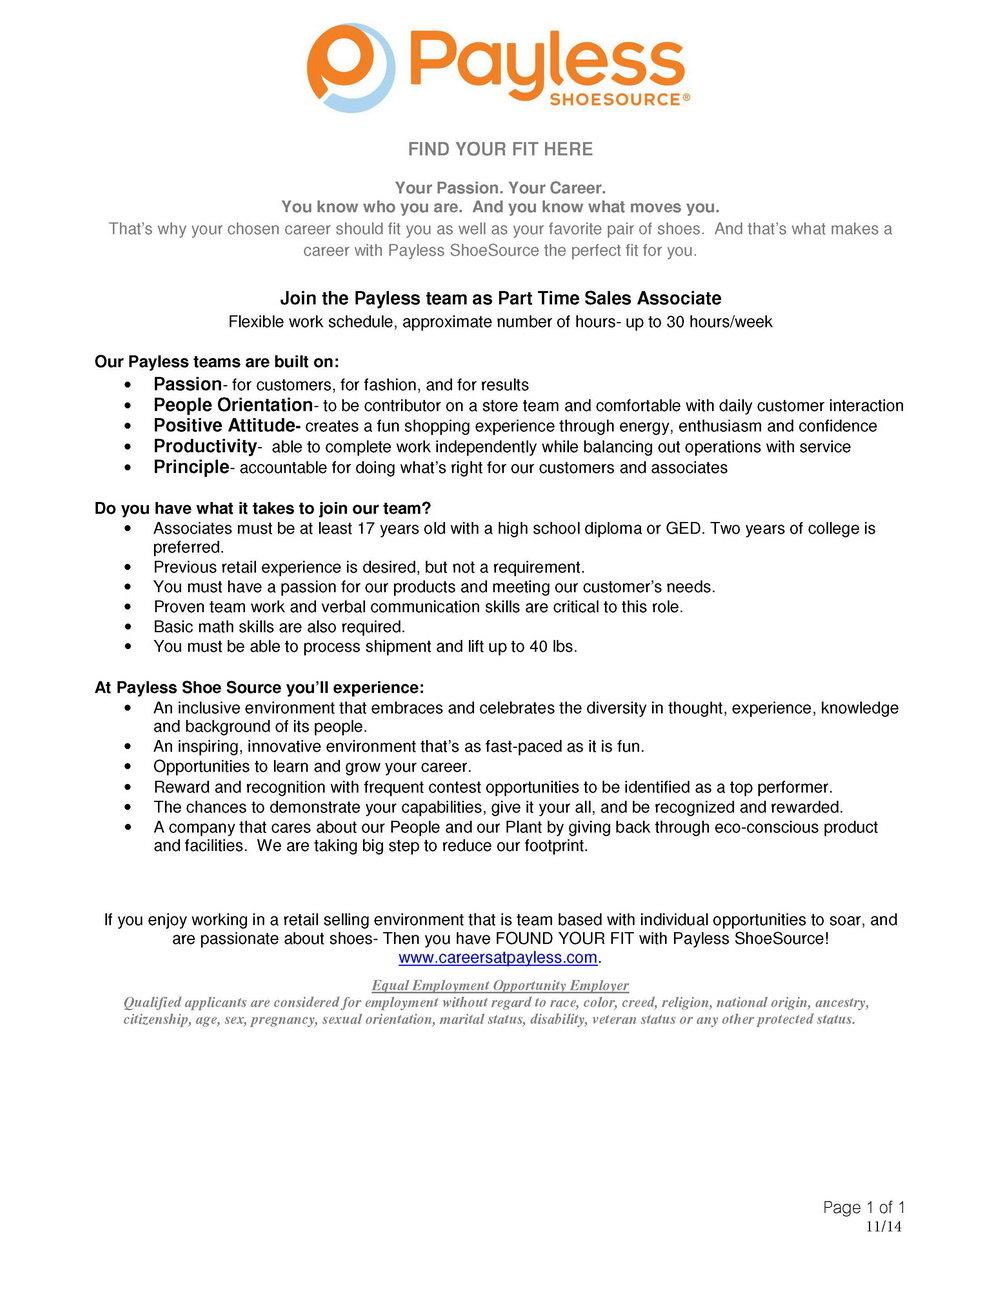 Payless Jobs Application Online